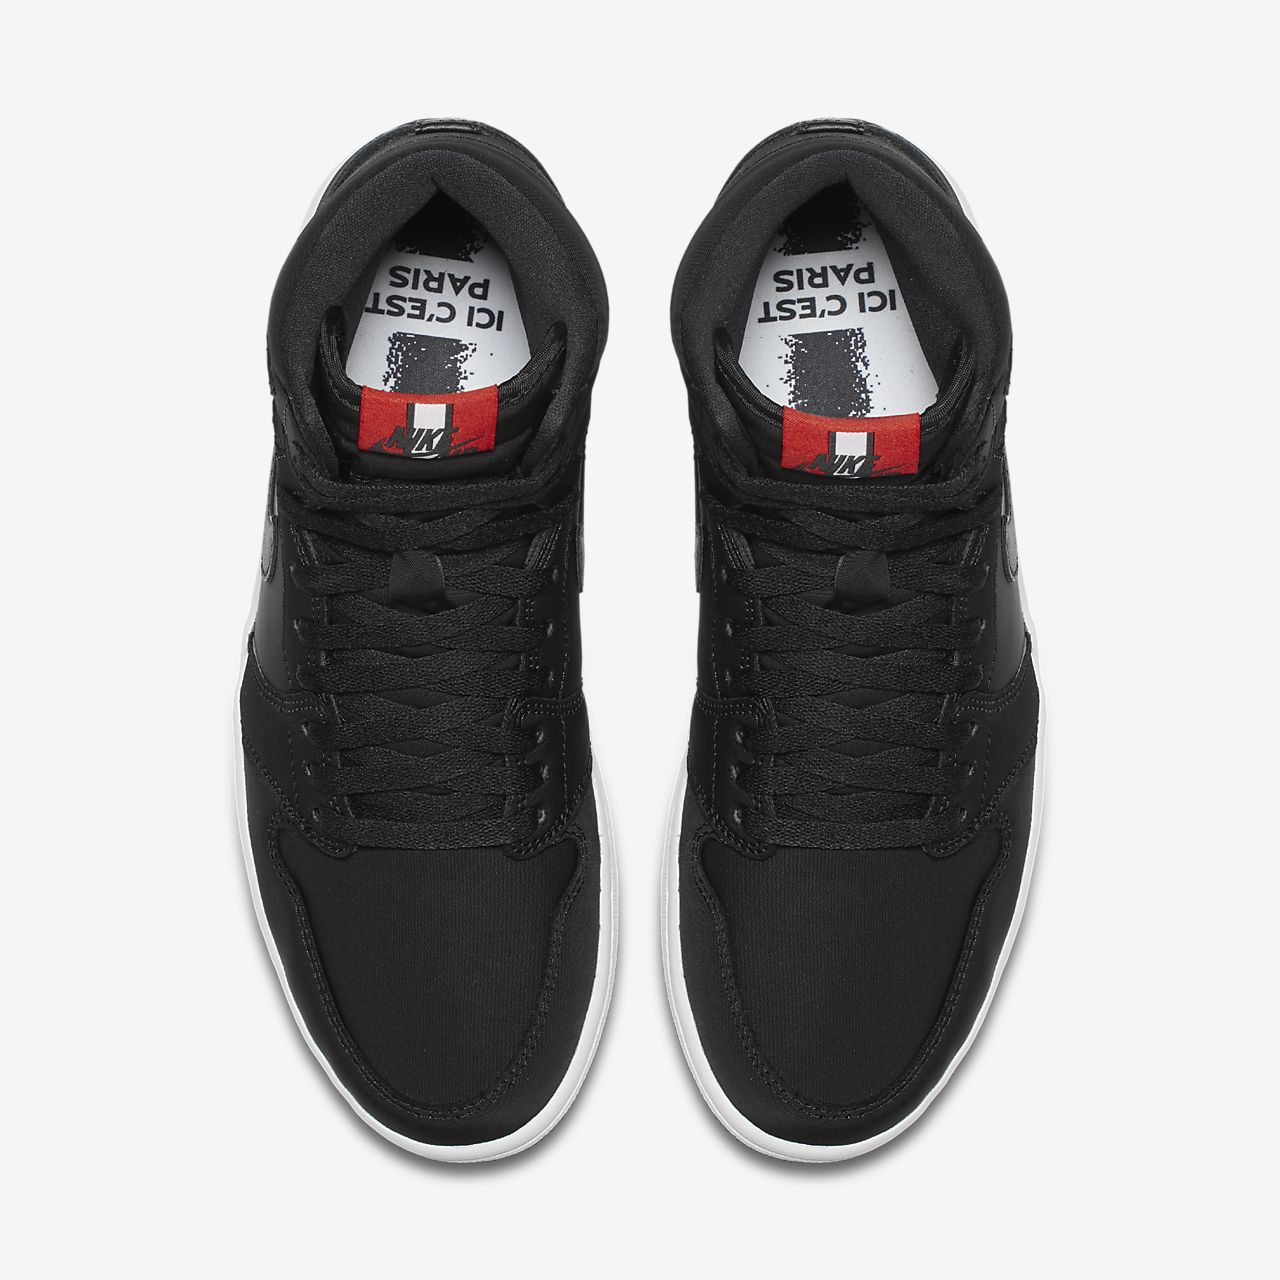 finest selection dcd65 68914 ... Air Jordan 1 Retro High PSG Men s Shoe